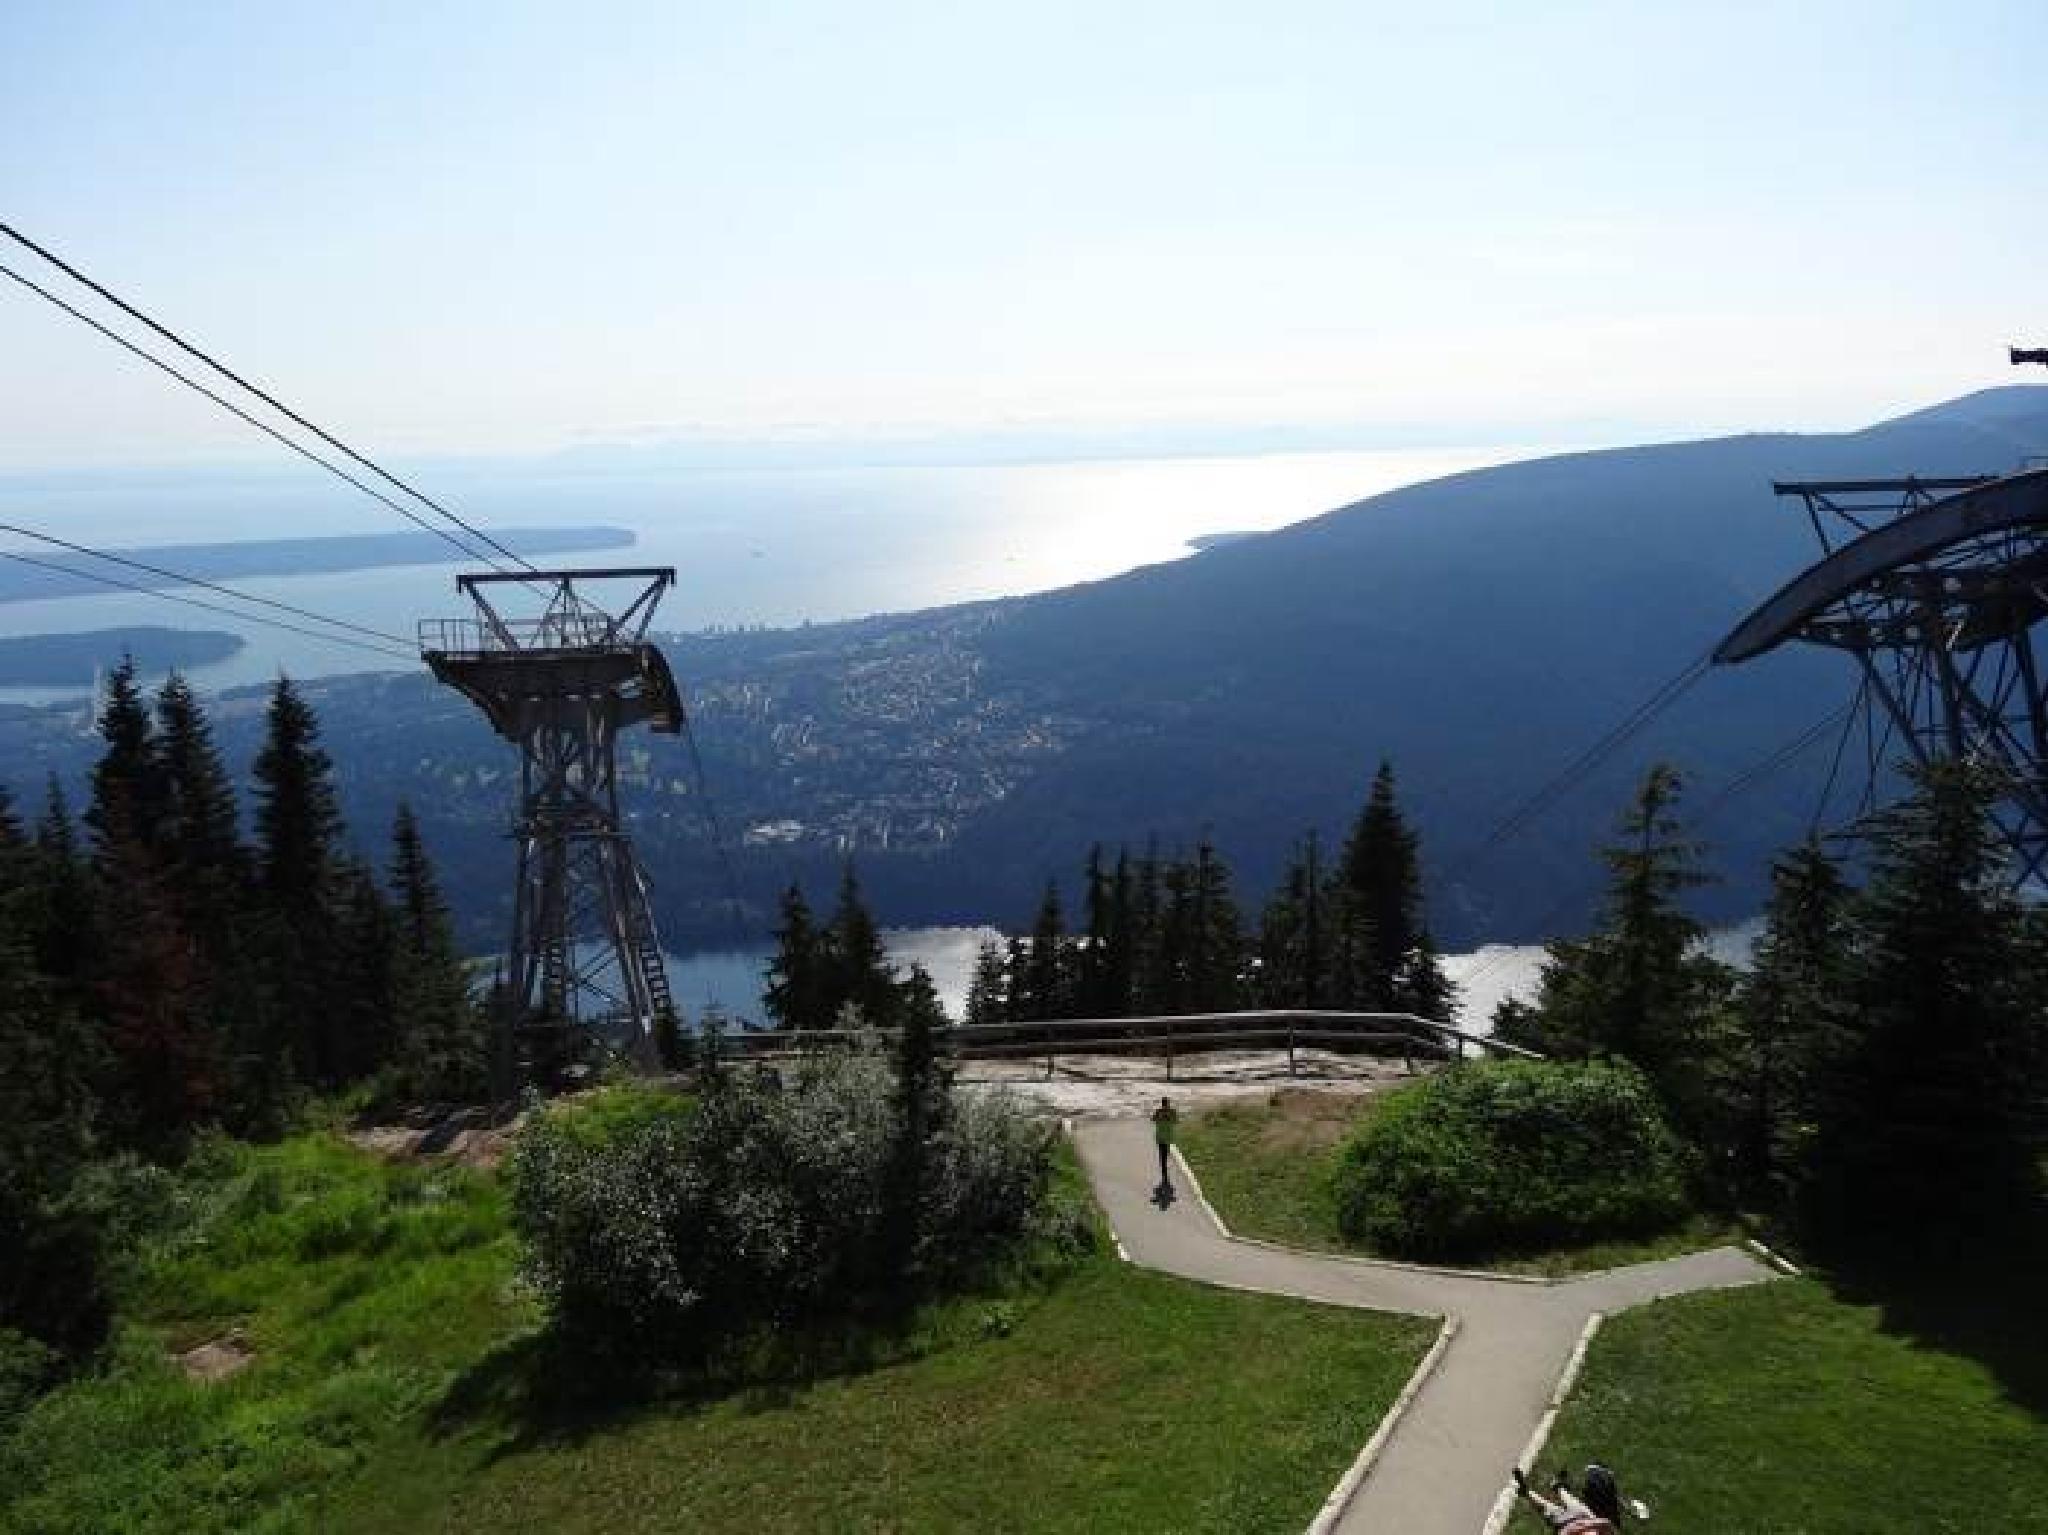 Grouse Mountain, British Columbia, Canada by riddelljane